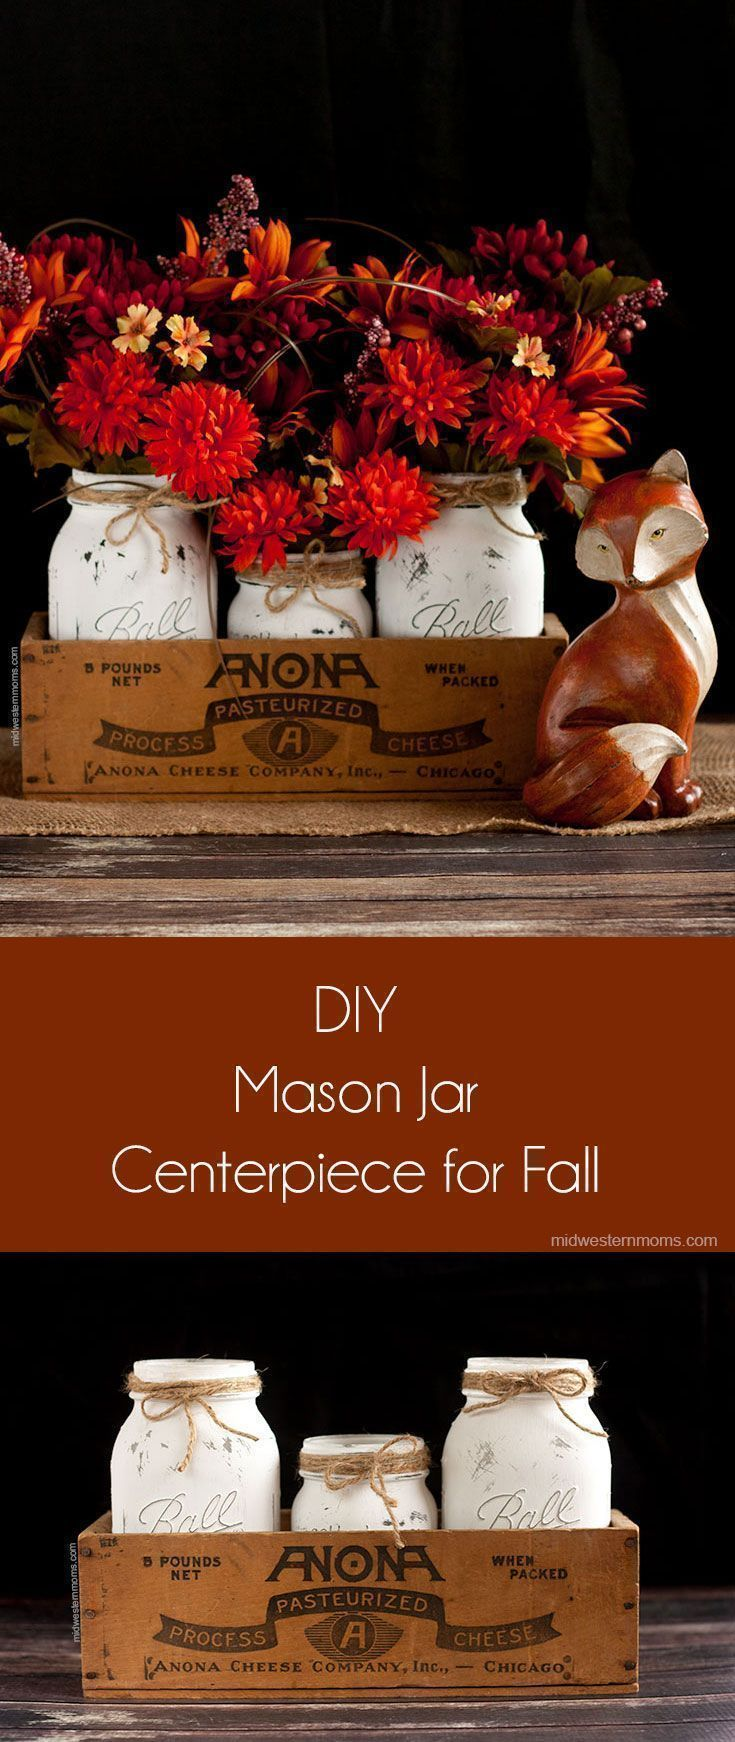 Diy mason jar centerpiece for fall centerpieces jar and mason jar